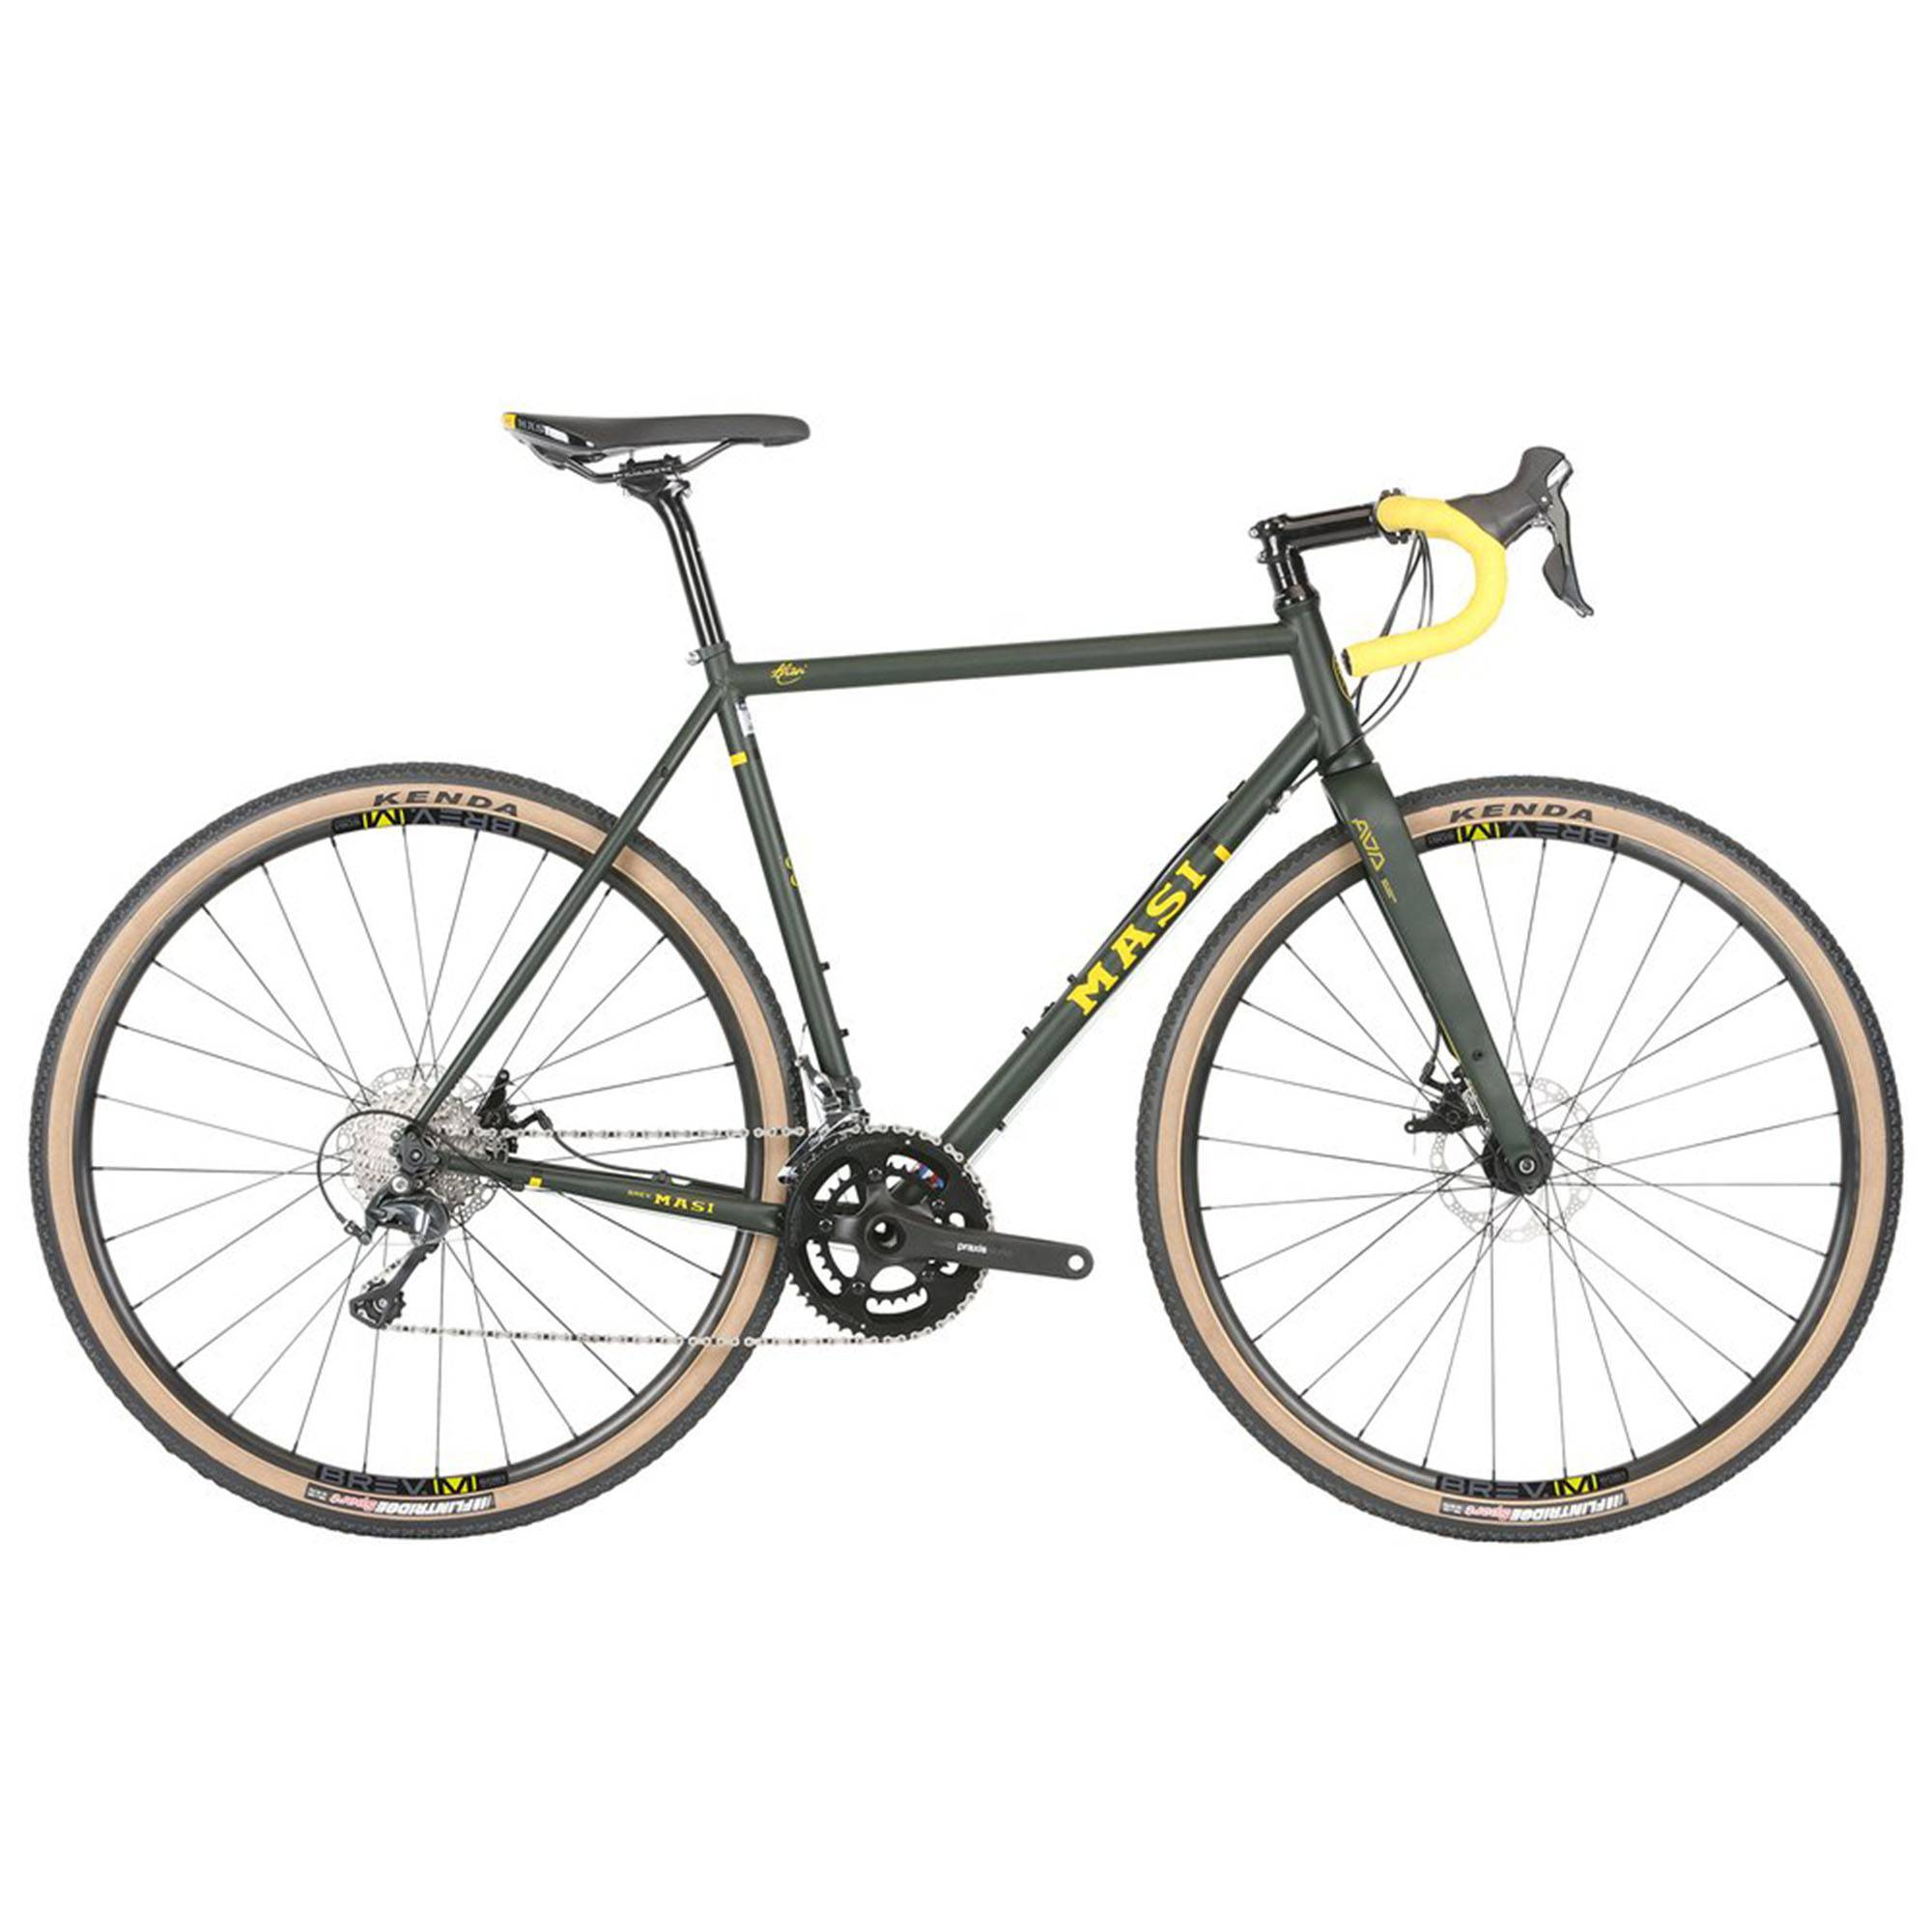 Masi CXGR Expert Gravel Bike '20  - Green - Size: 51